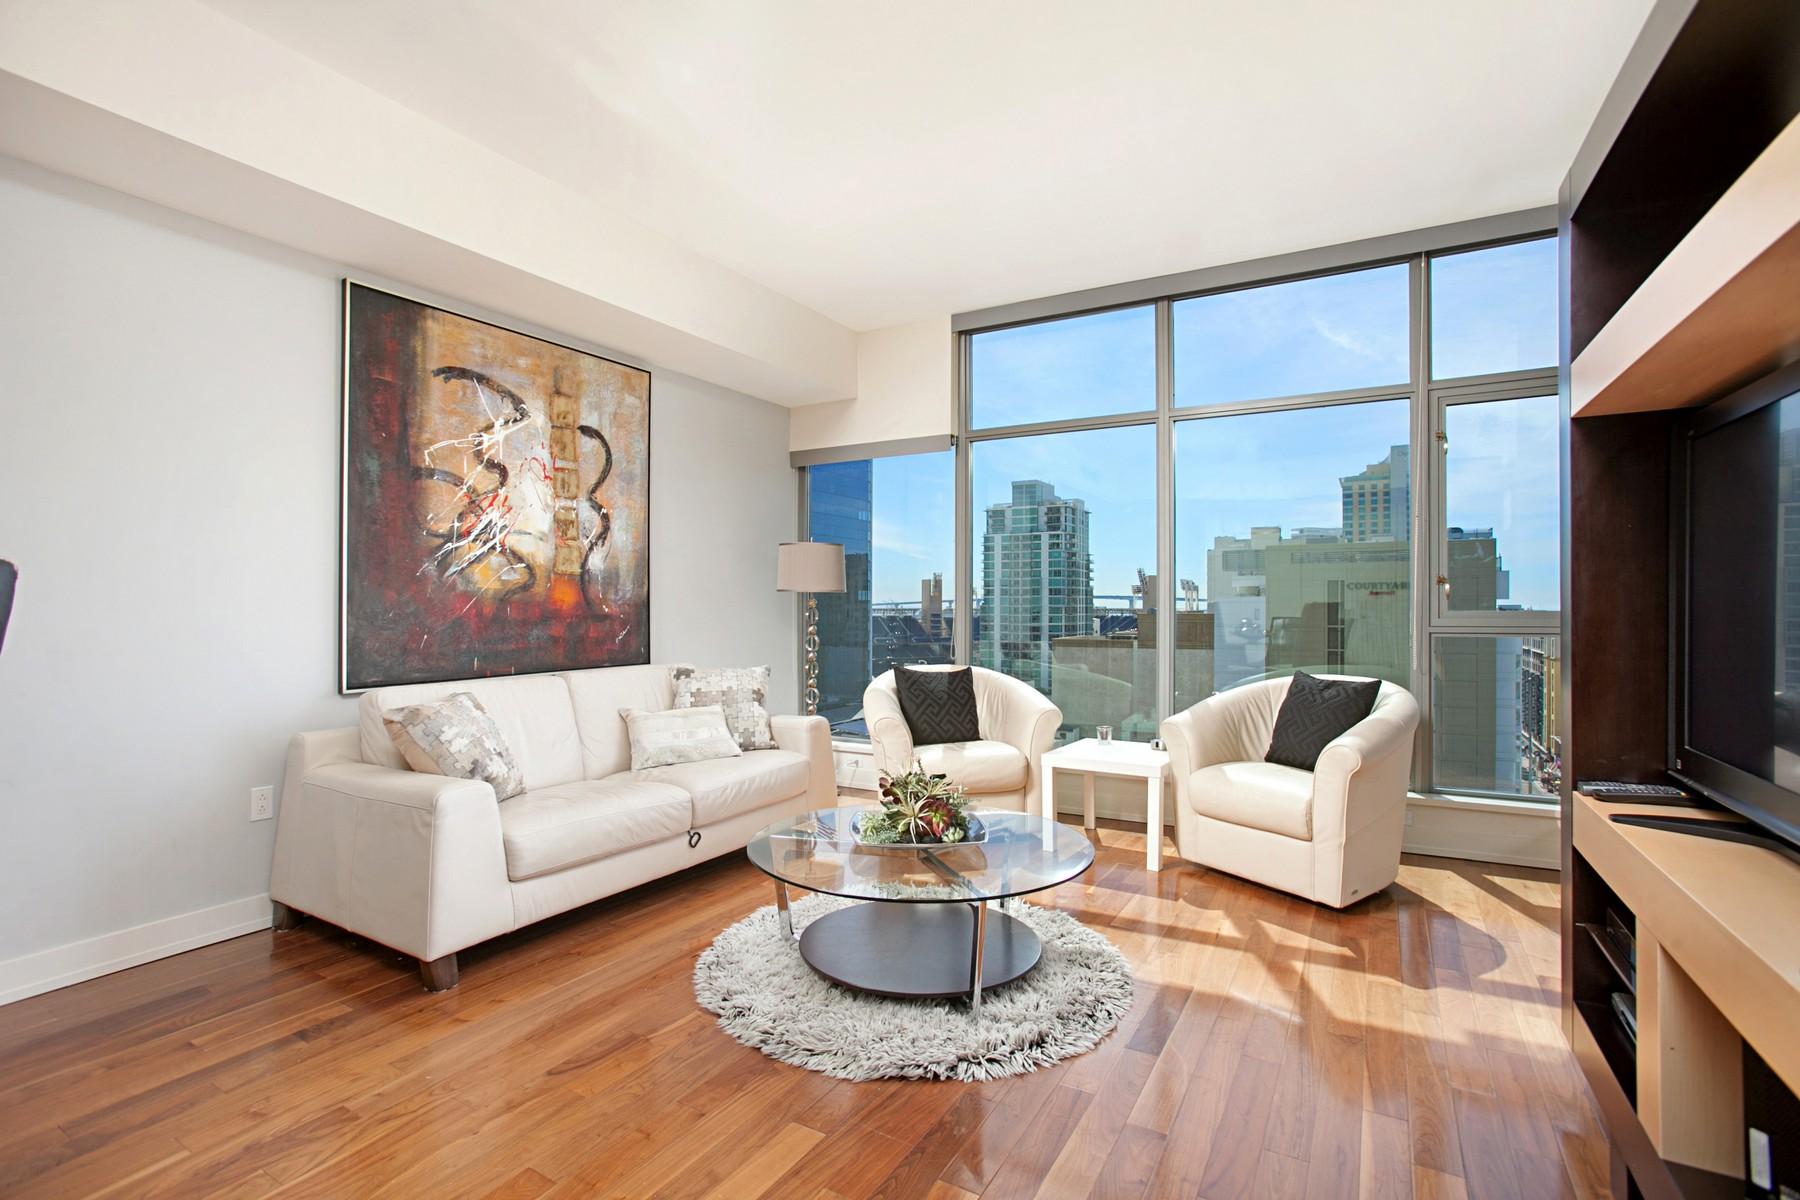 Condominium for Sale at 575 6th Avenue,1108 575 6th Avenue 1108 Downtown San Diego, San Diego, California, 92101 United States